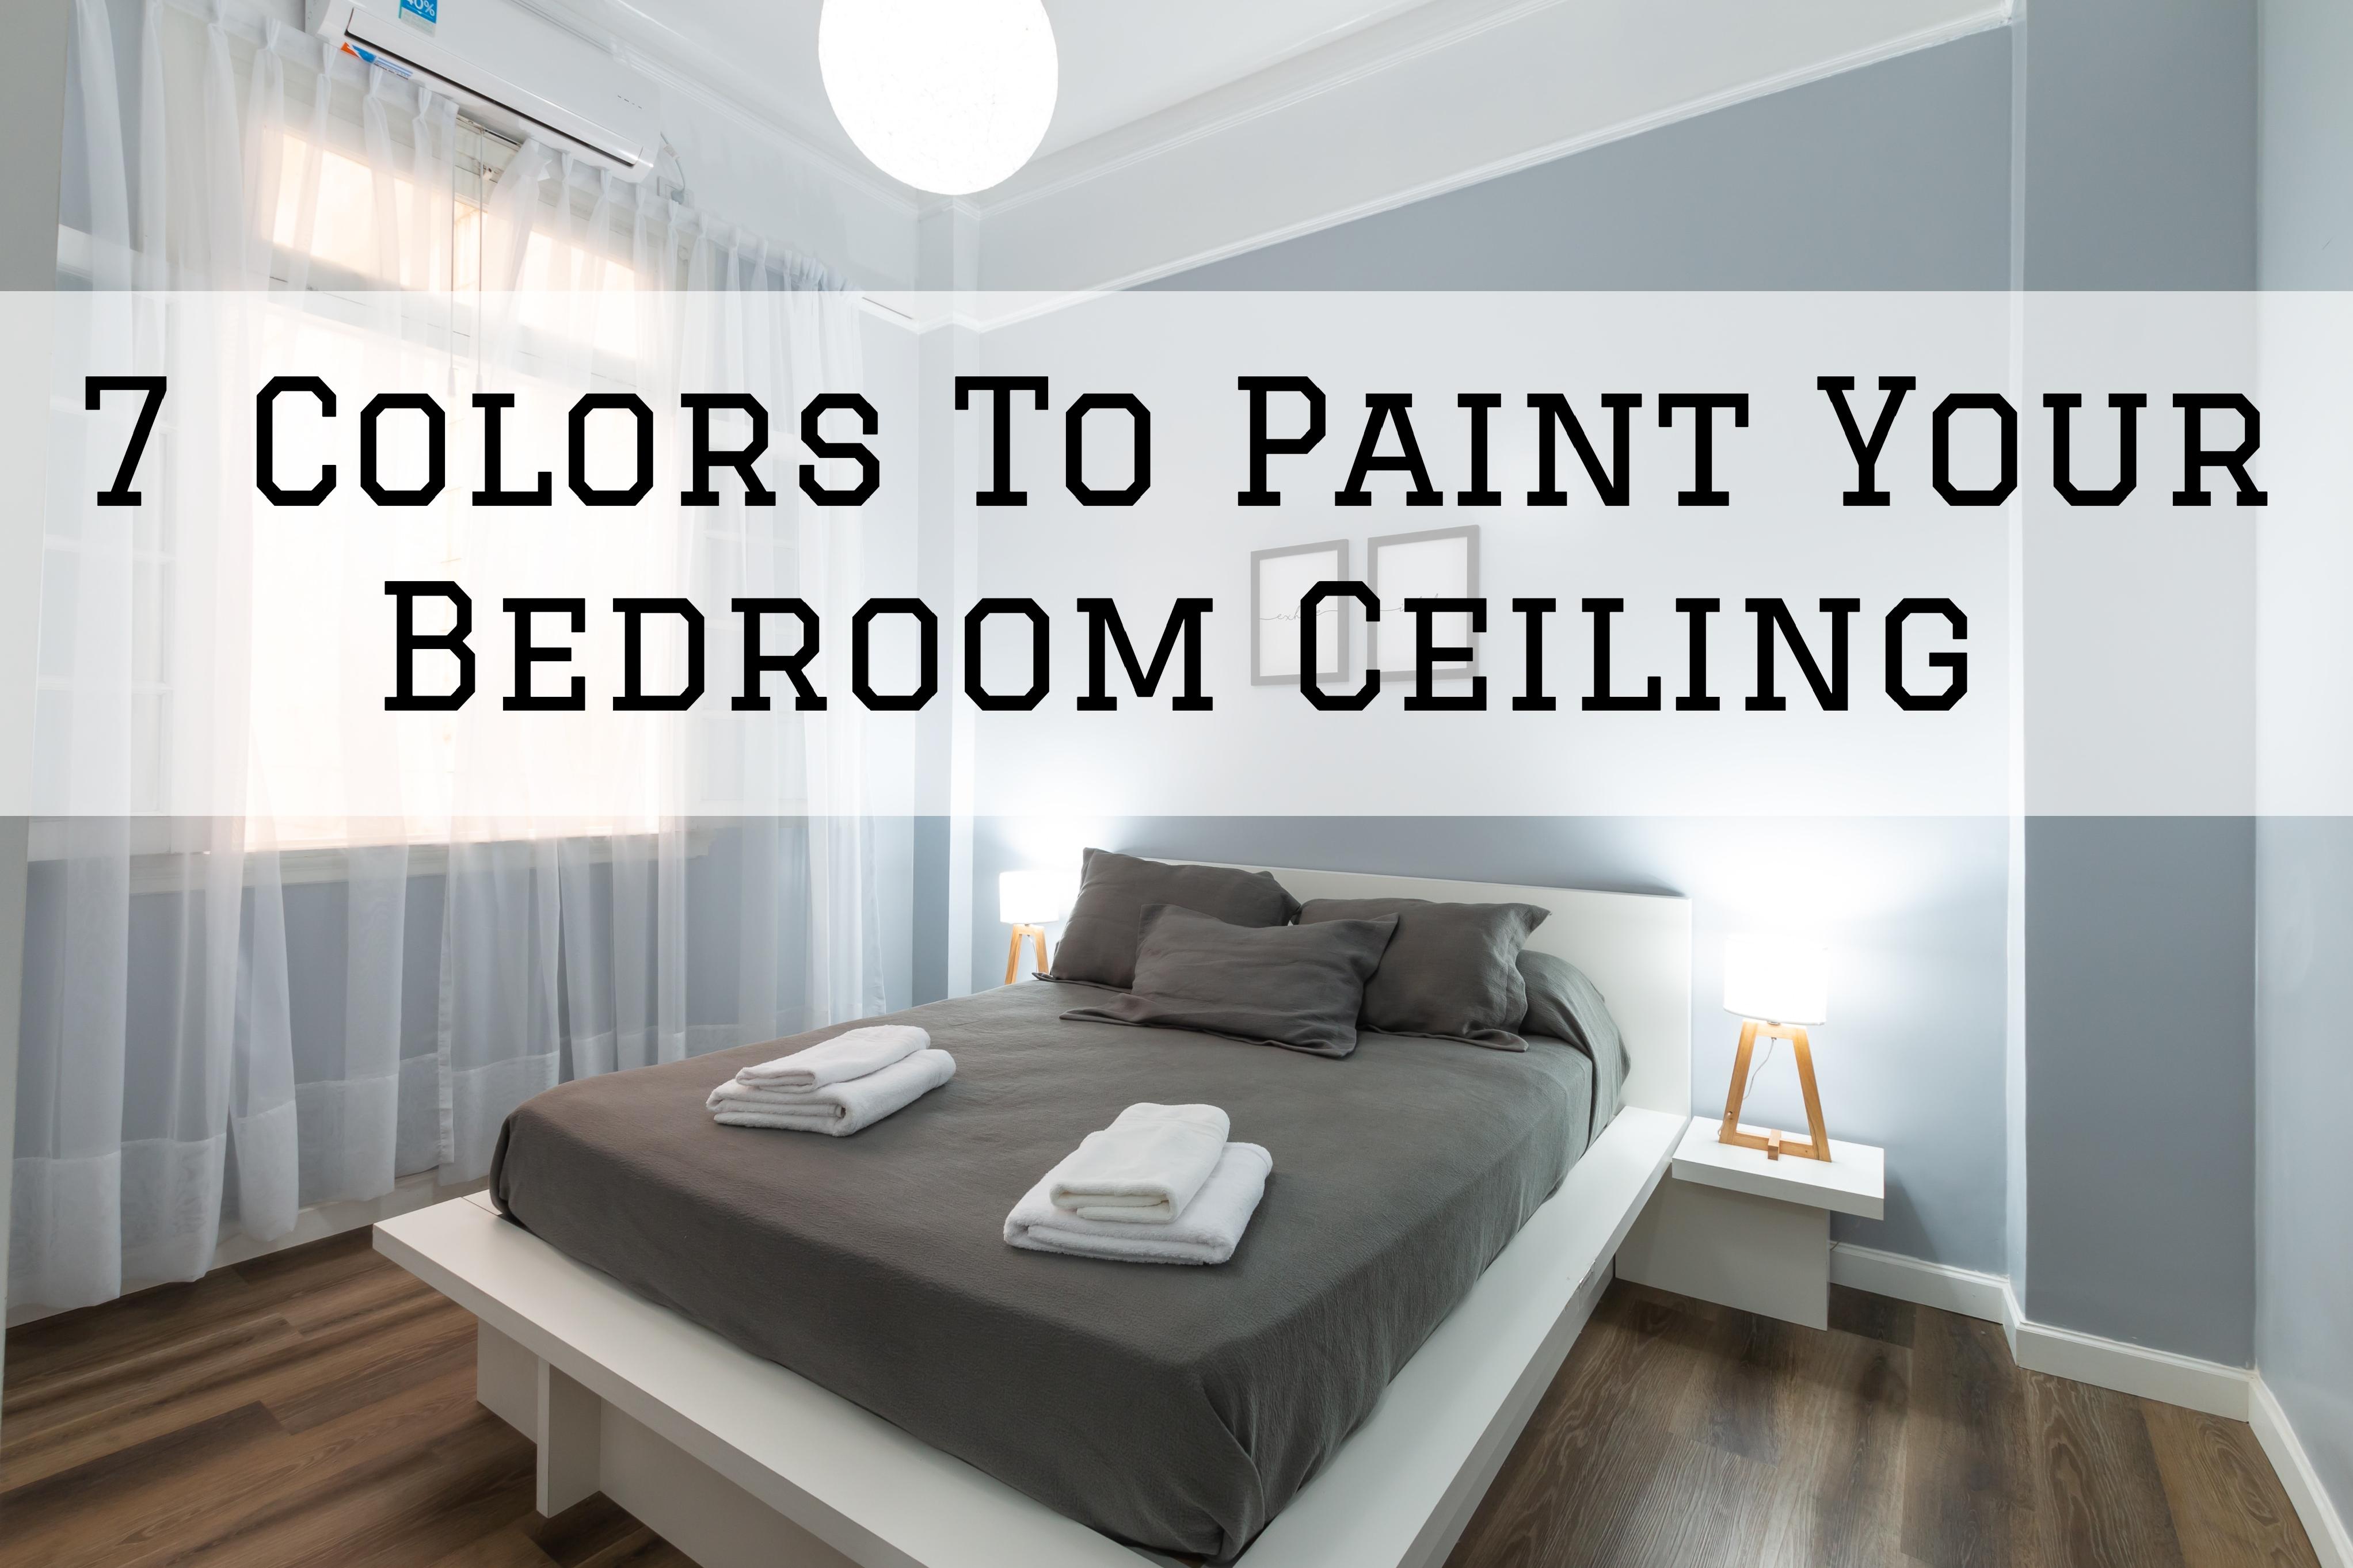 2021-03-16 Selah Painting St Louis MO Bedroom Ceiling Colors